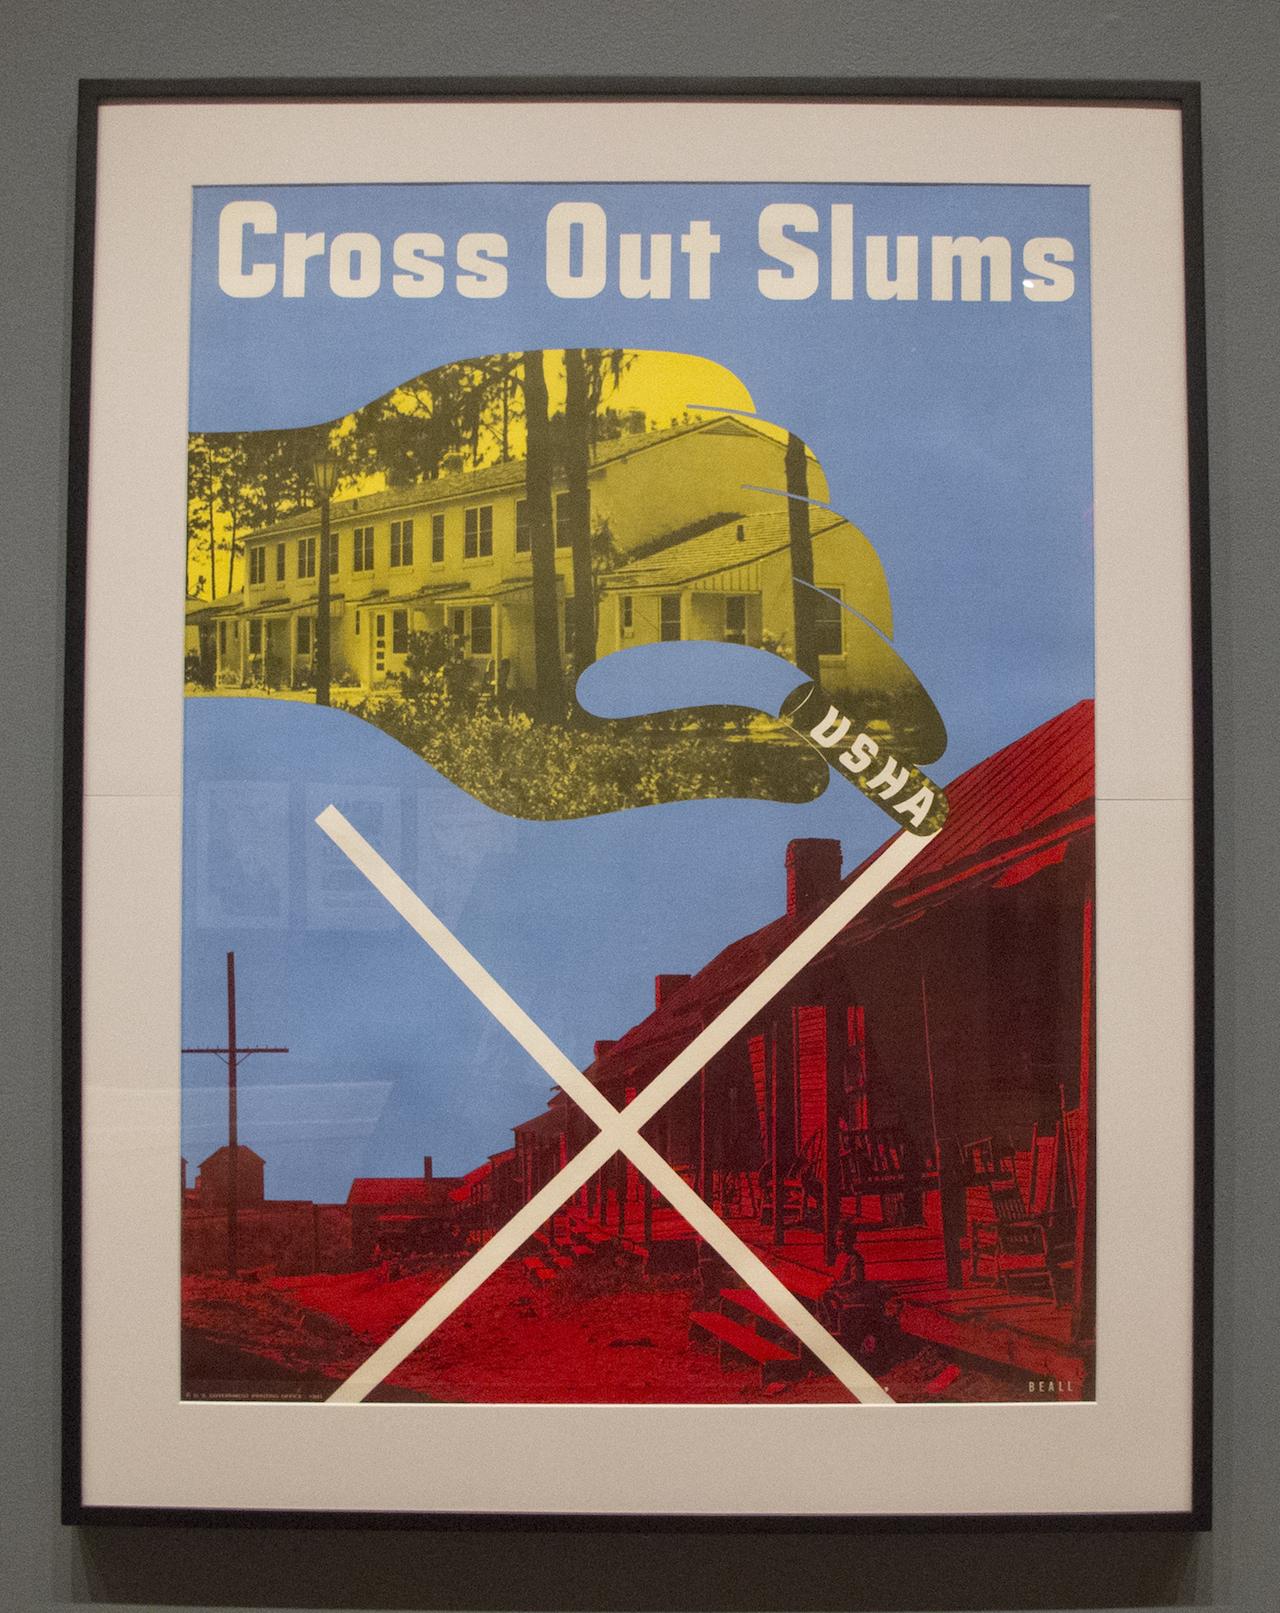 Cross out slums